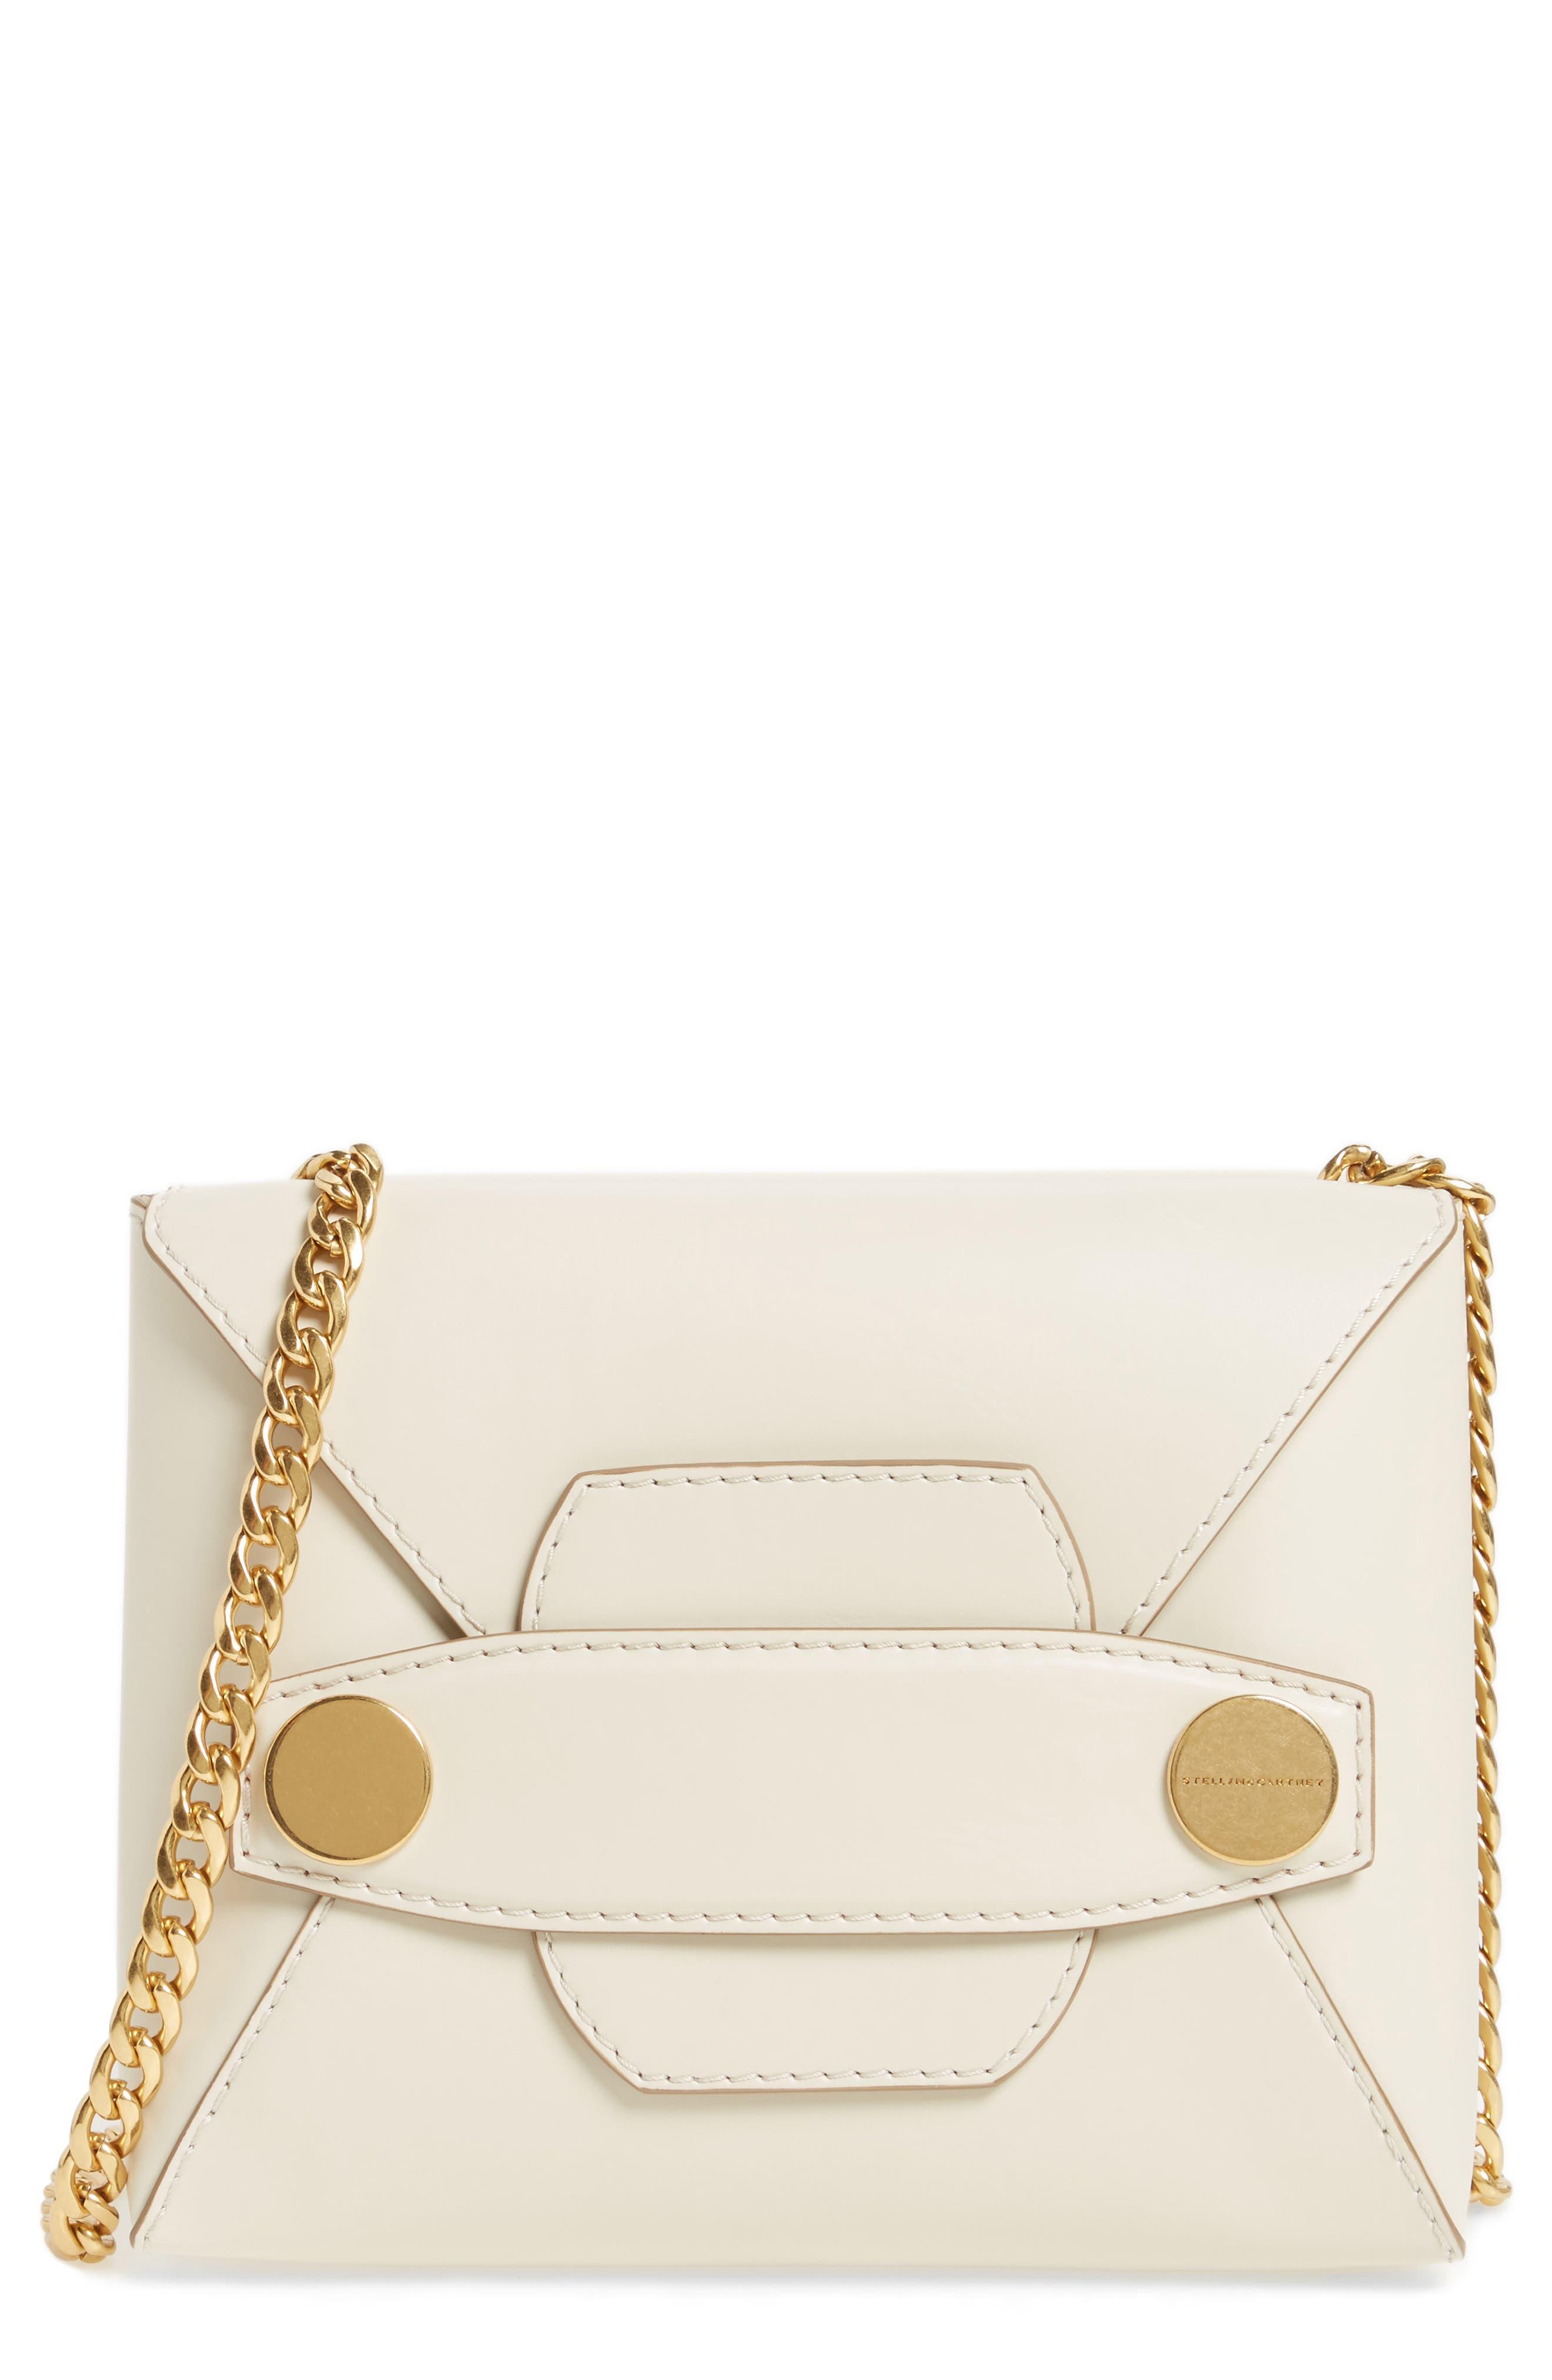 Main Image - Stella McCartney Small Faux Leather Crossbody Bag